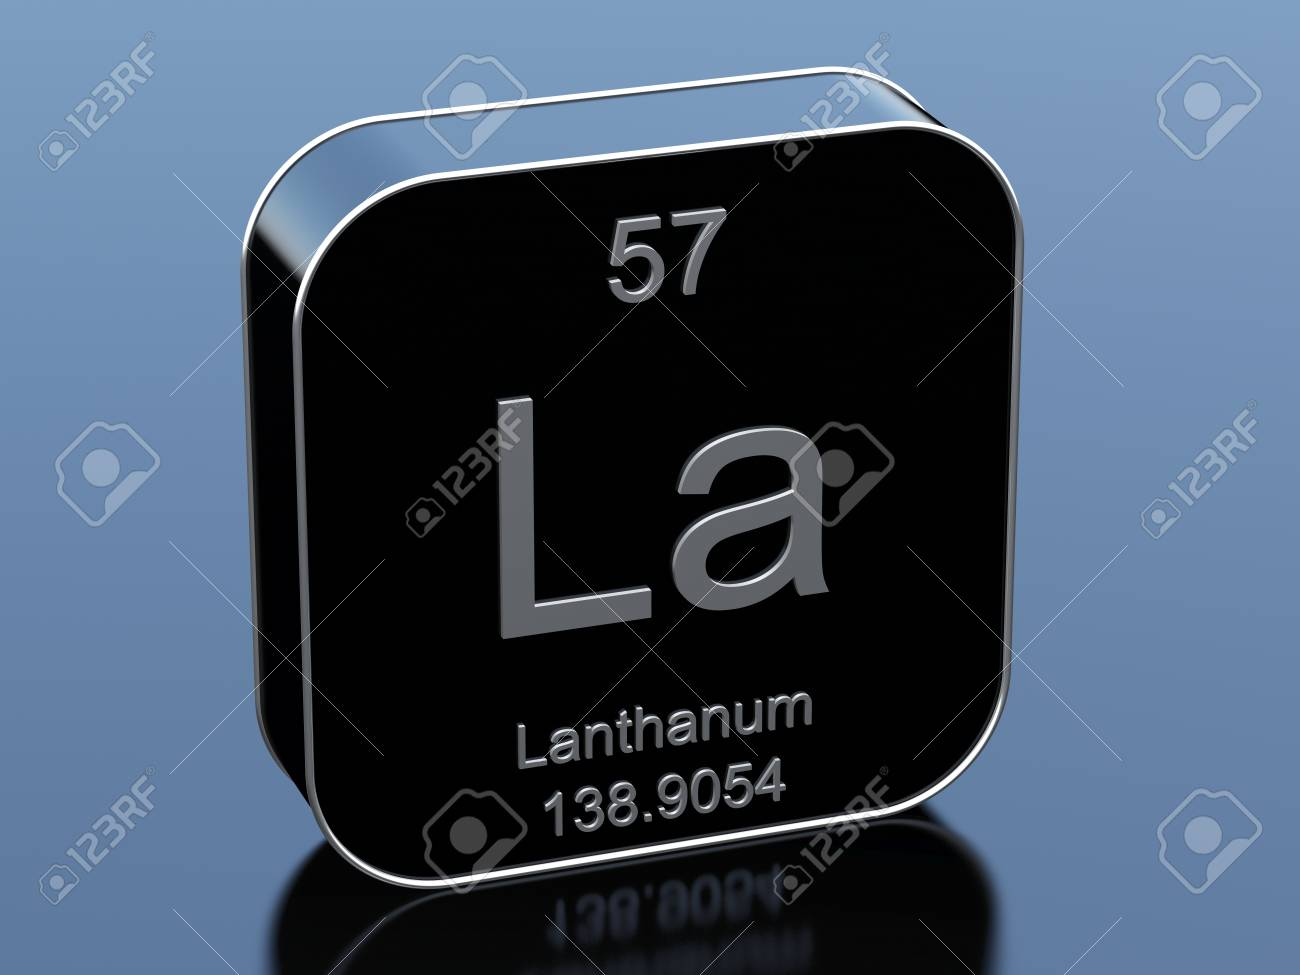 Lanthanum symbol from periodic table stock photo picture and lanthanum symbol from periodic table stock photo 76322233 gamestrikefo Gallery